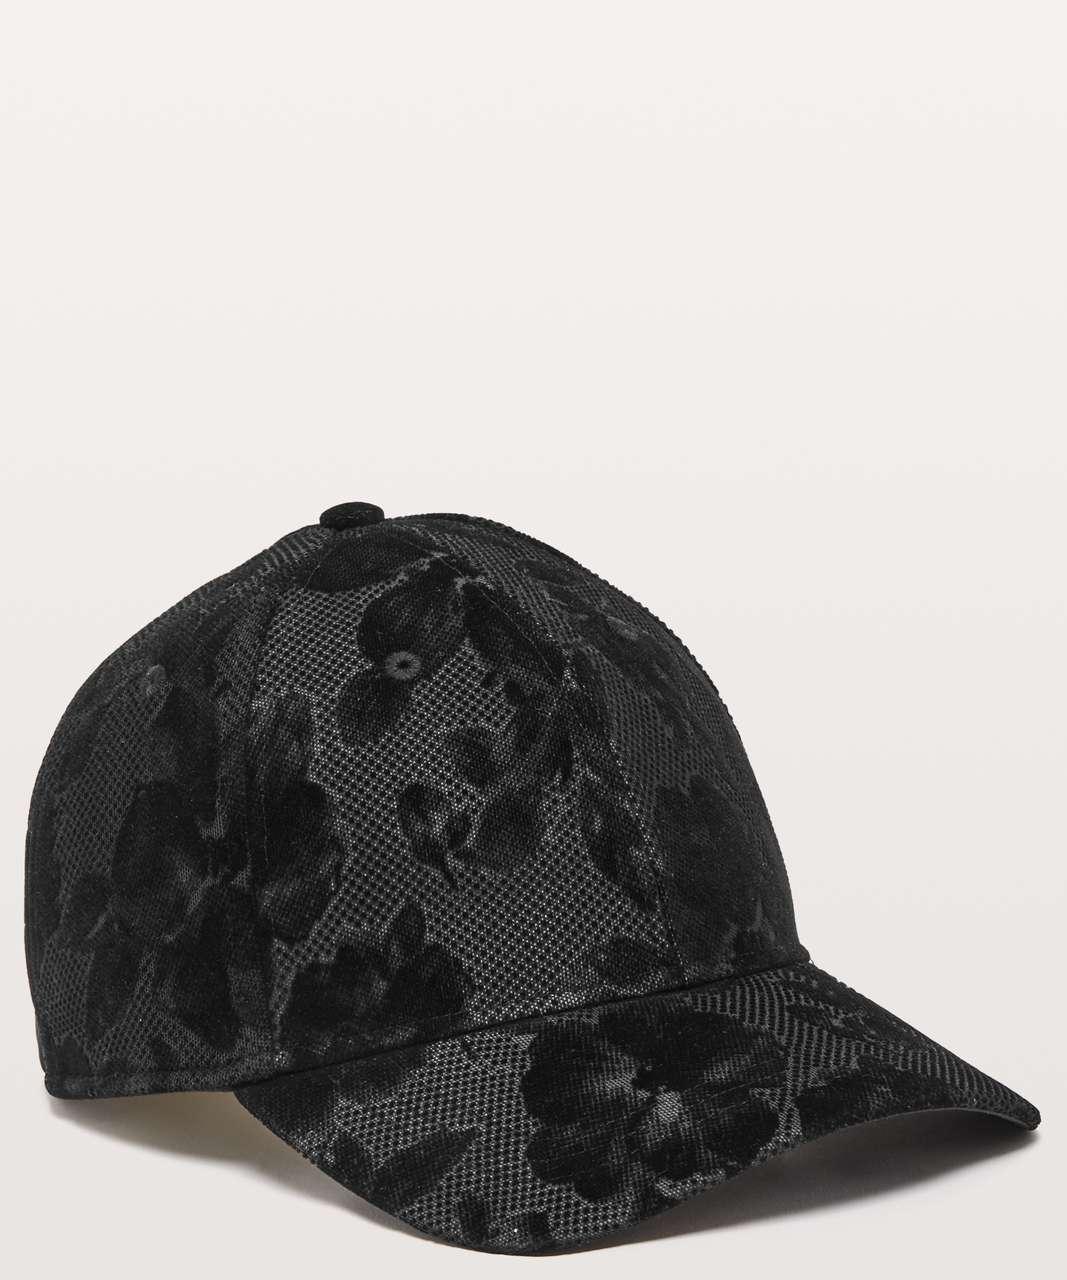 Lululemon Baller Hat *Flocked - Black / Silver Reflective